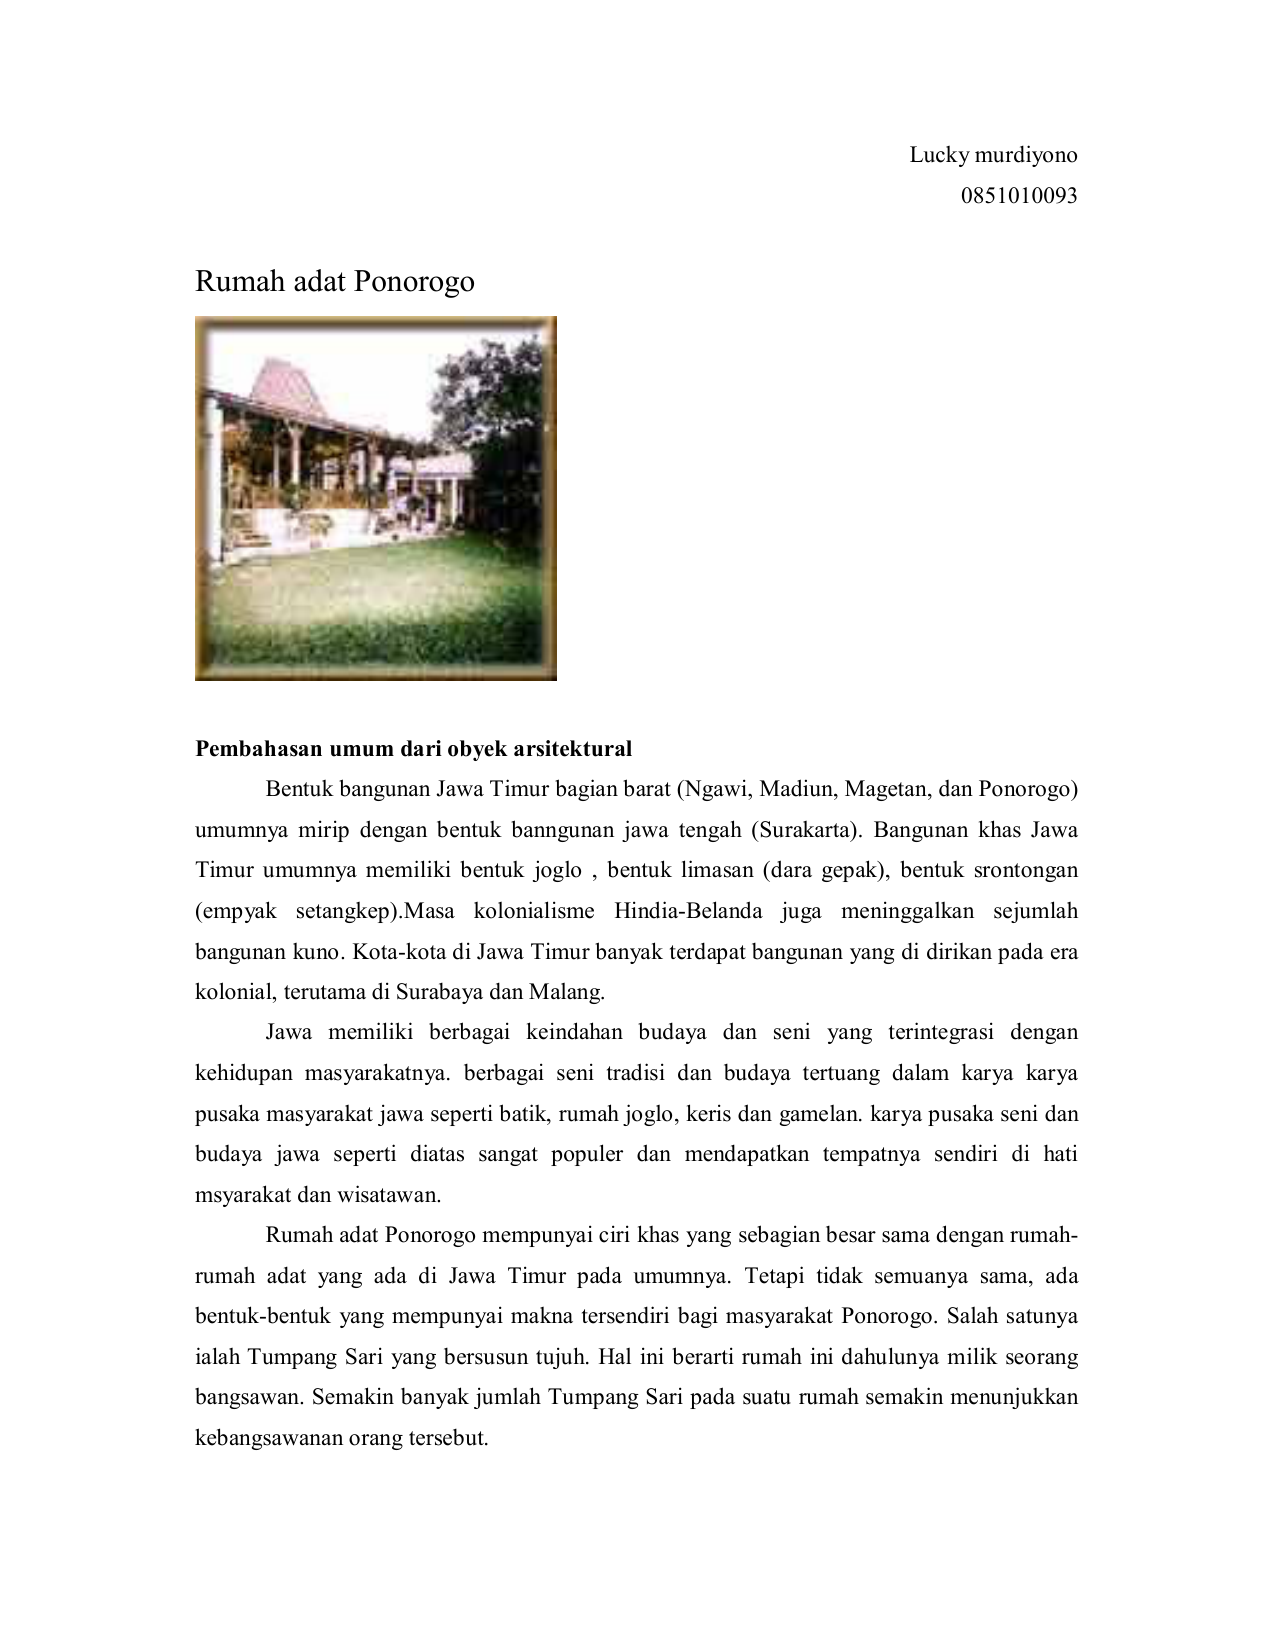 830 Koleksi Gambar Rumah Adat Jawa Tengah Dan Jawa Timur HD